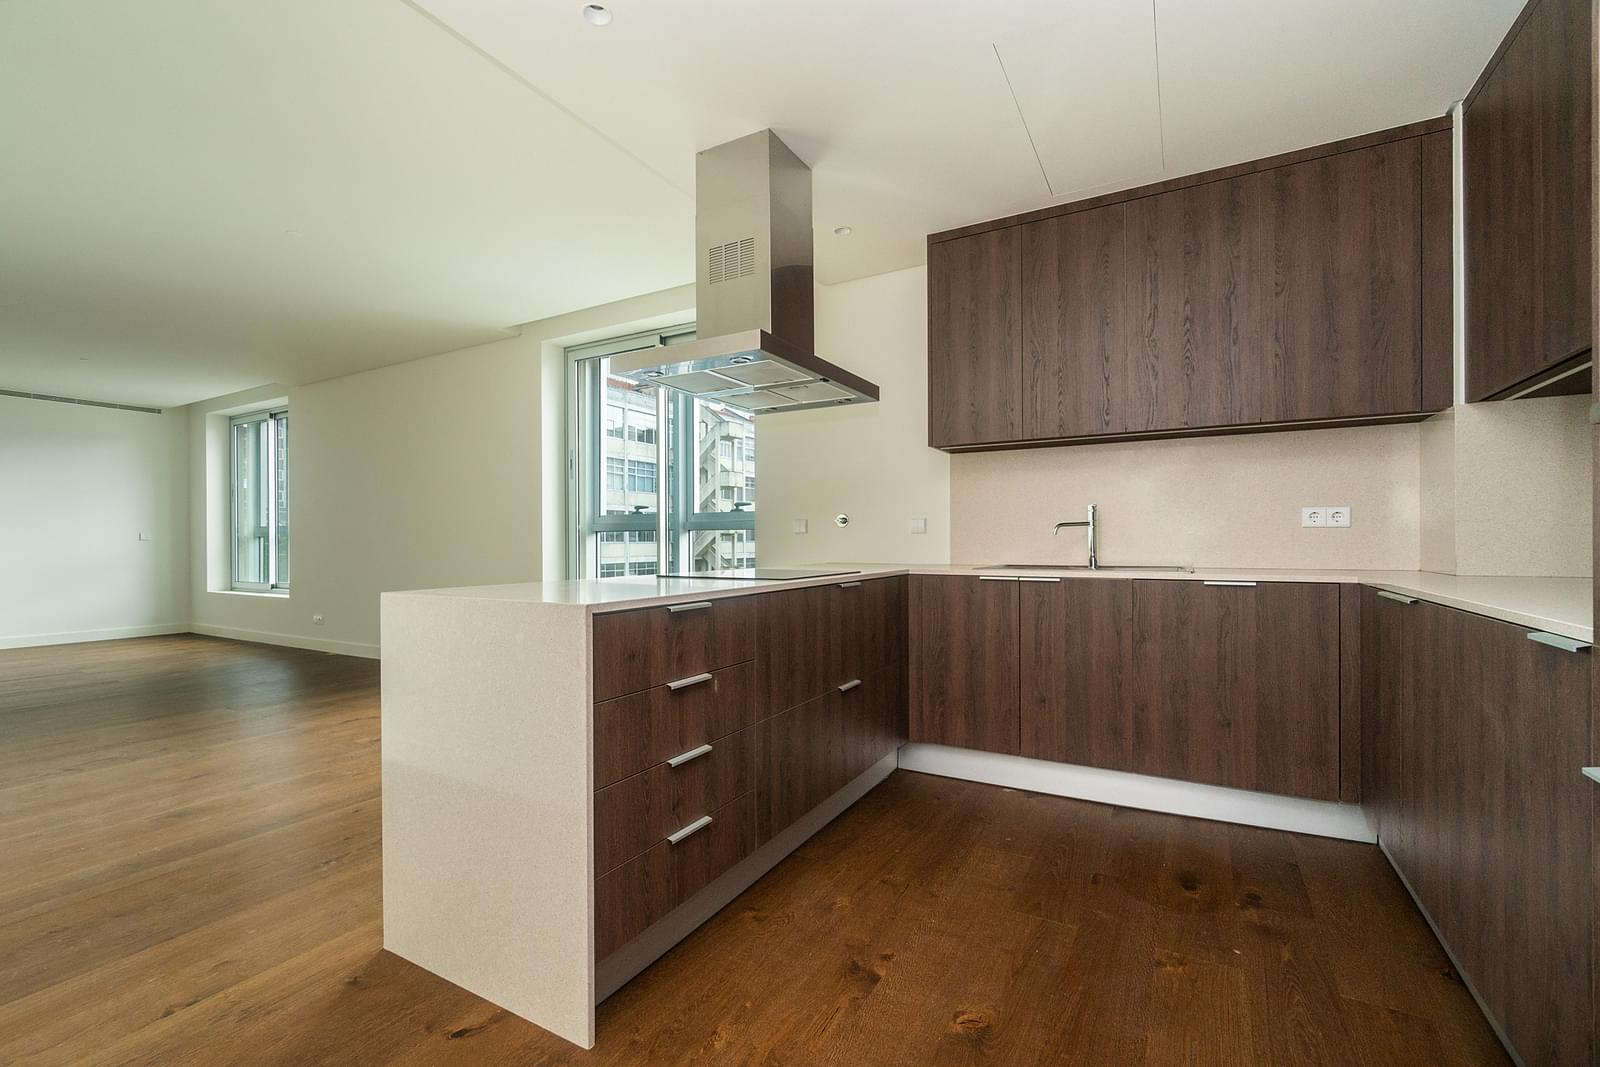 pf18694-apartamento-t3-lisboa-c7e50967-18ef-49a6-ad7f-ee507b38dea1